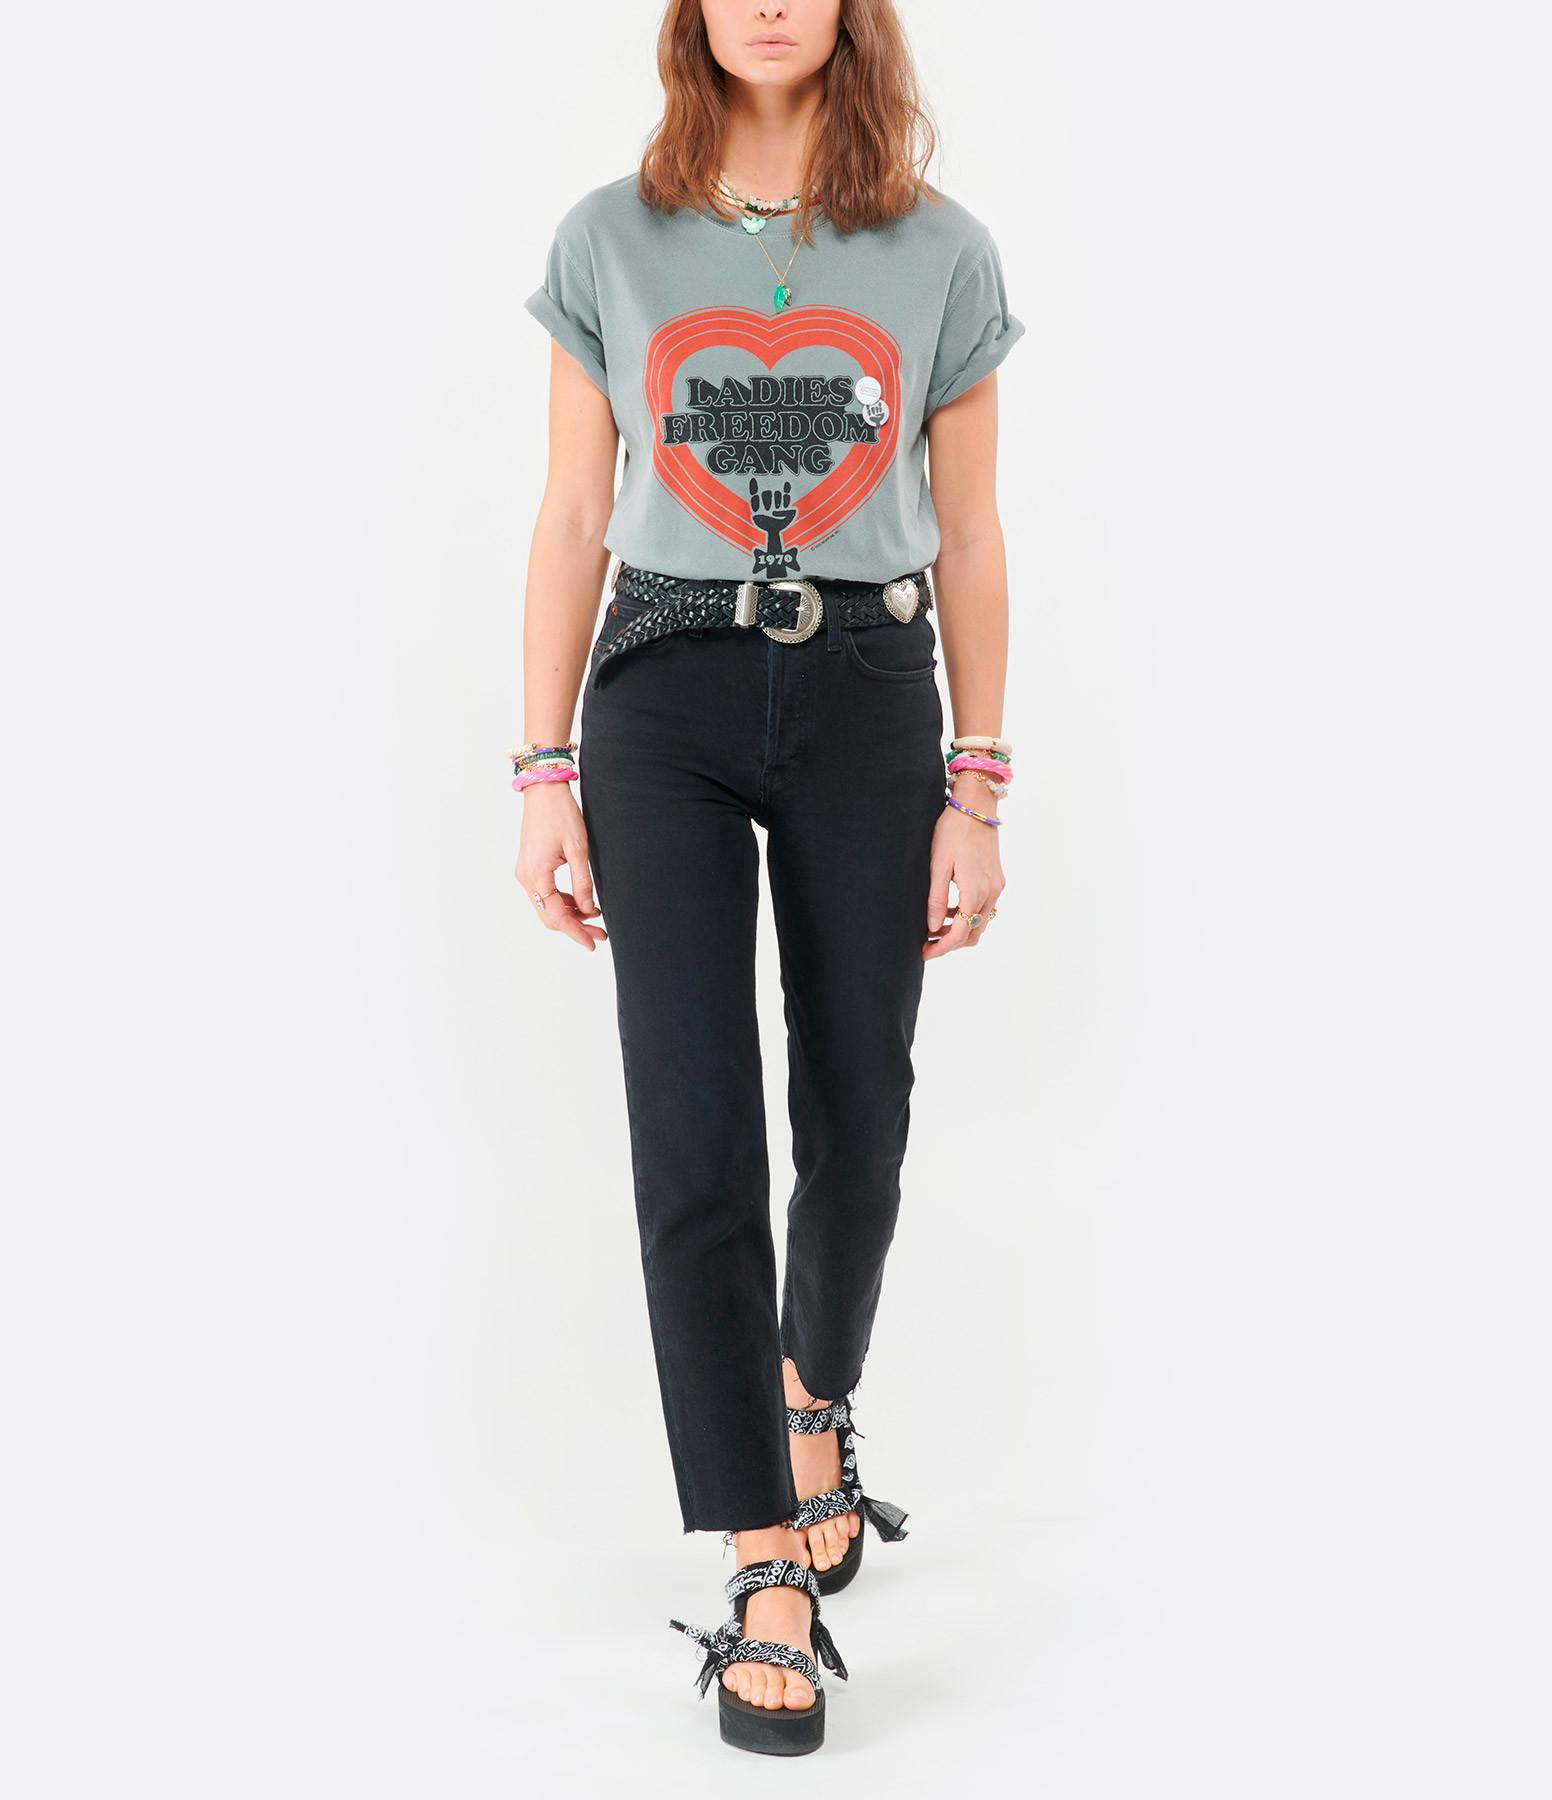 NEWTONE - Tee-shirt Trucker Freedom Coton Gris